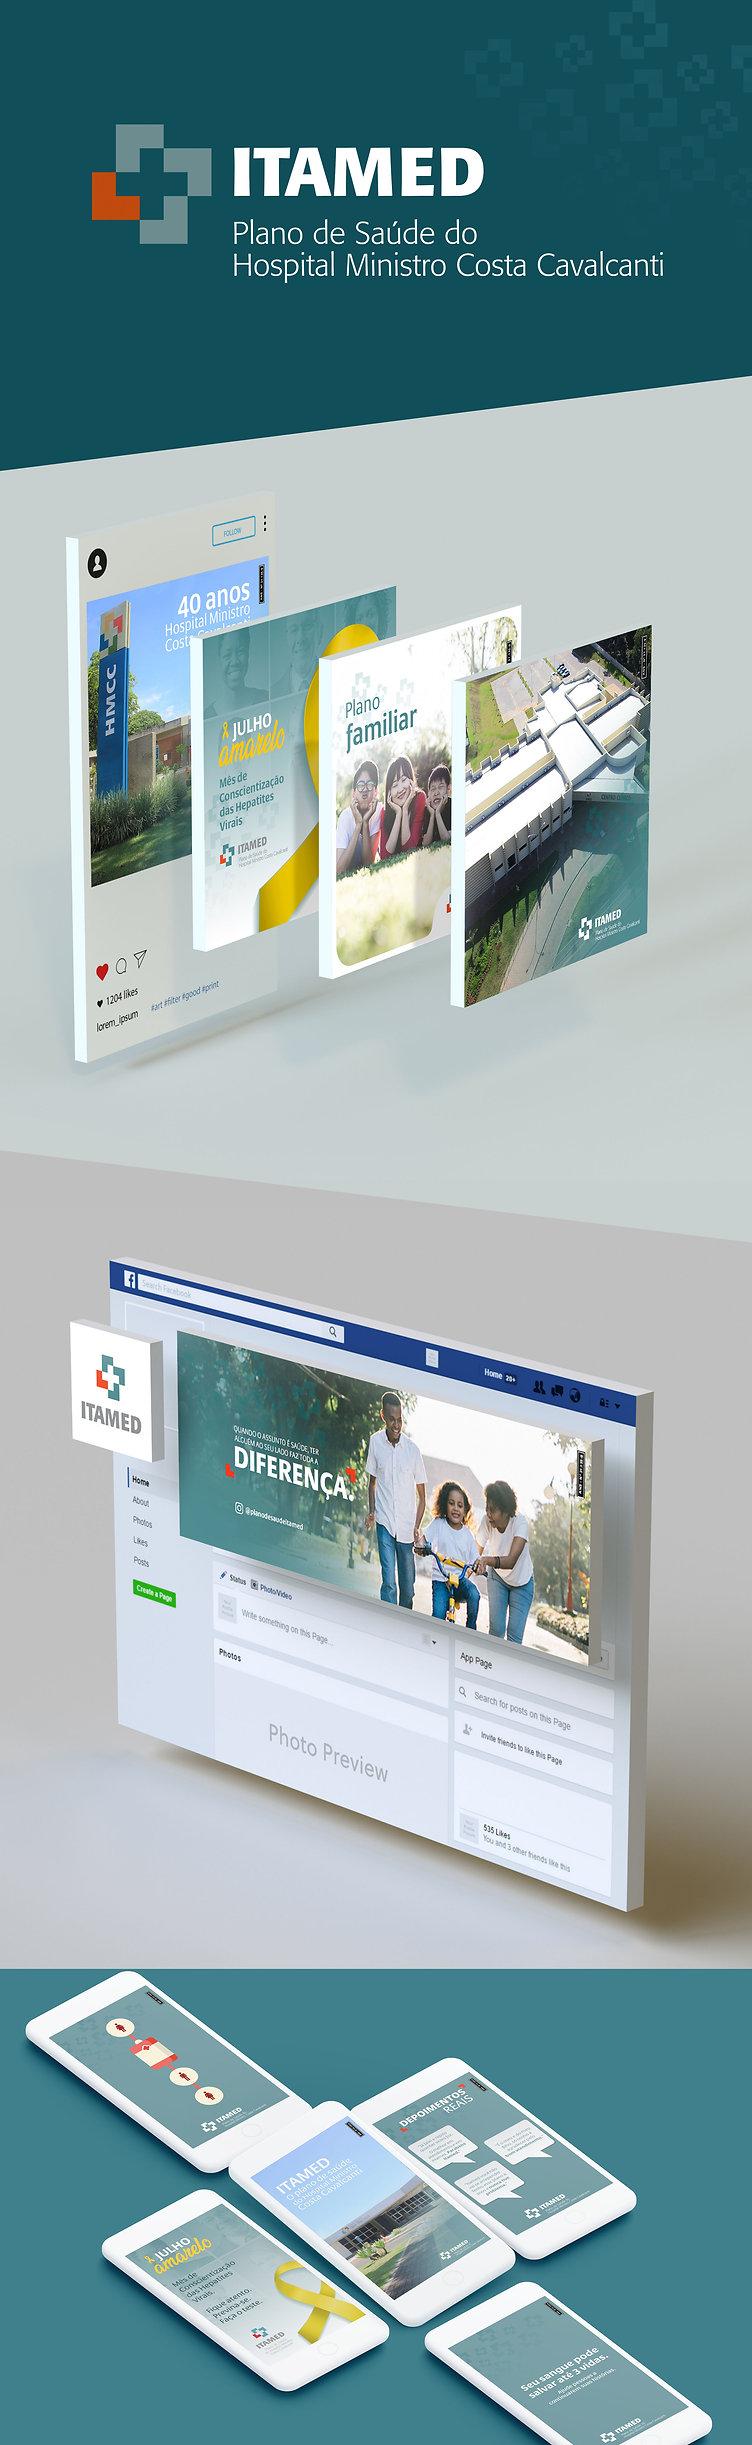 portfolio_itamed.jpg